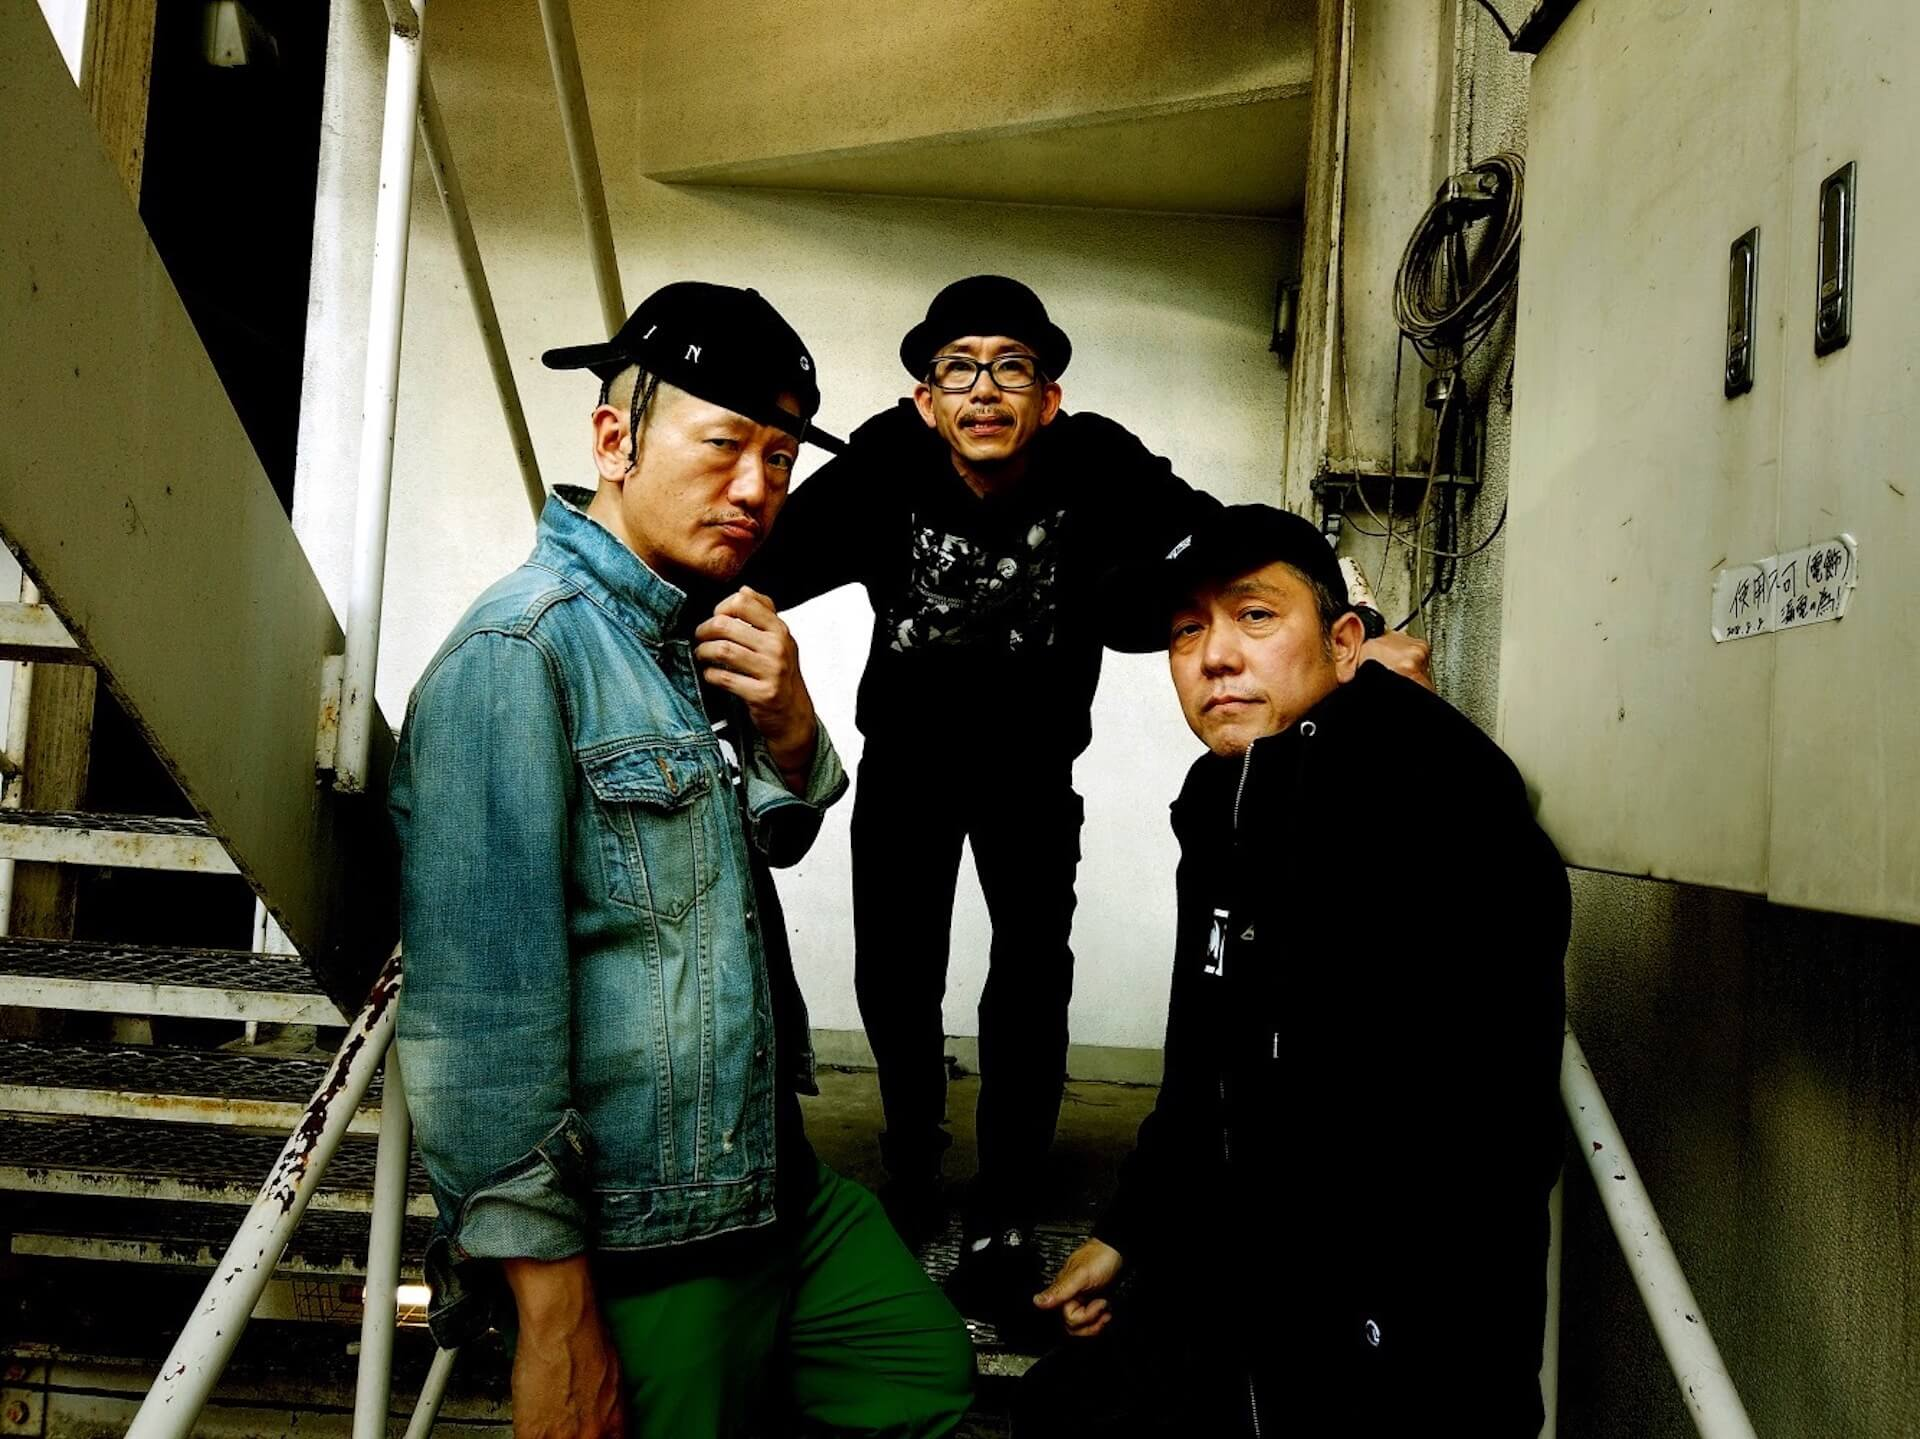 SOUL SCREAMが前作から18年ぶりに新曲をリリース!Apple Music、Spotify、AWAにてプレイリストも公開 music200619_soulscream_01